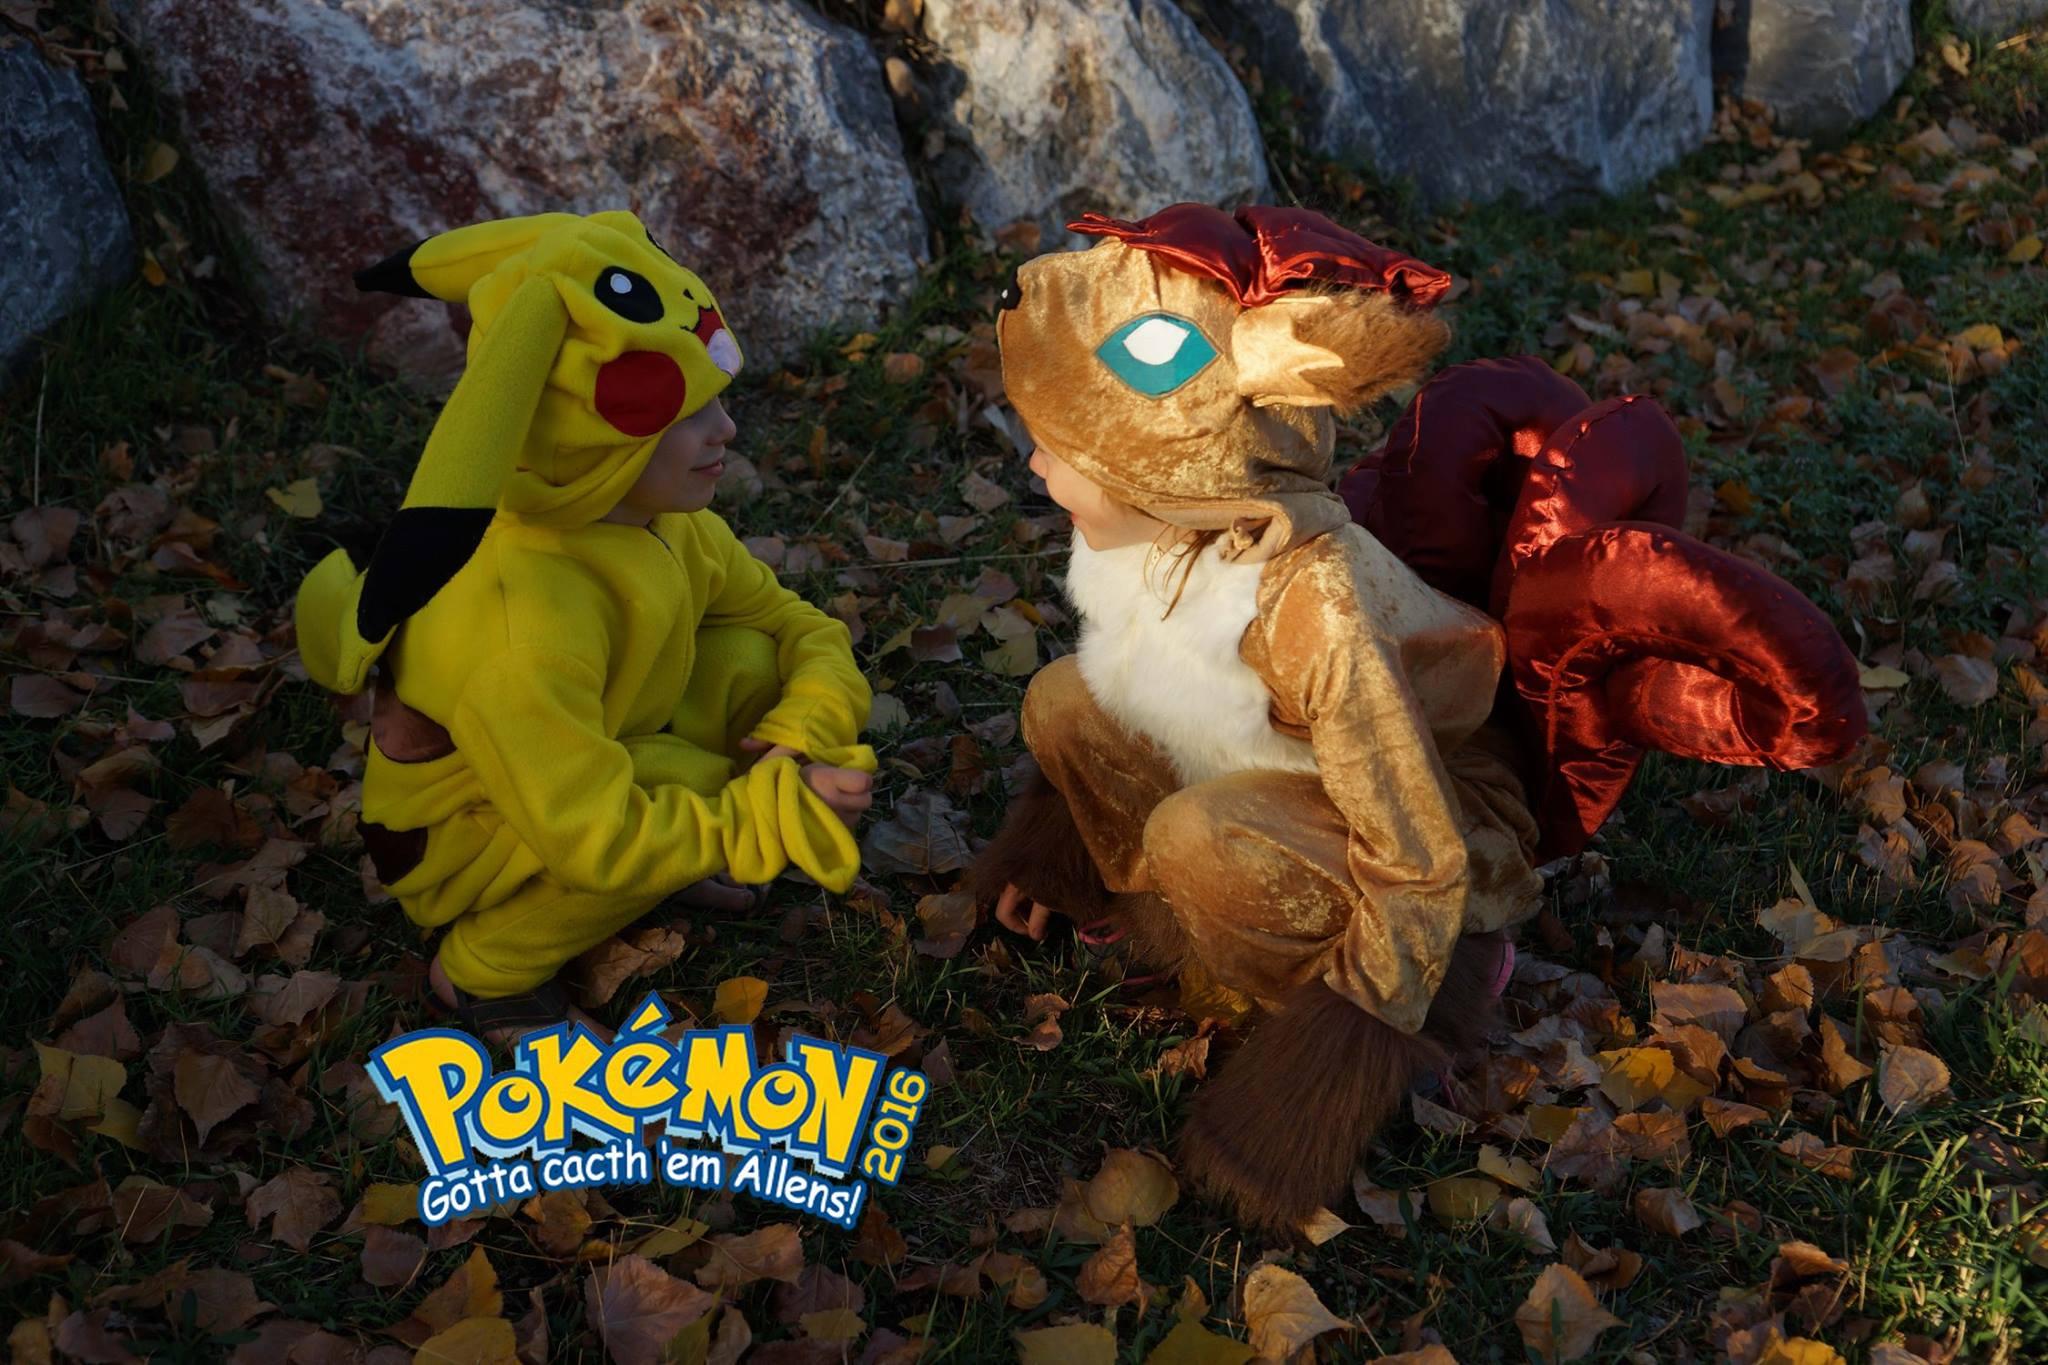 Pikachu meets Vulpix (Cyrus and Clar